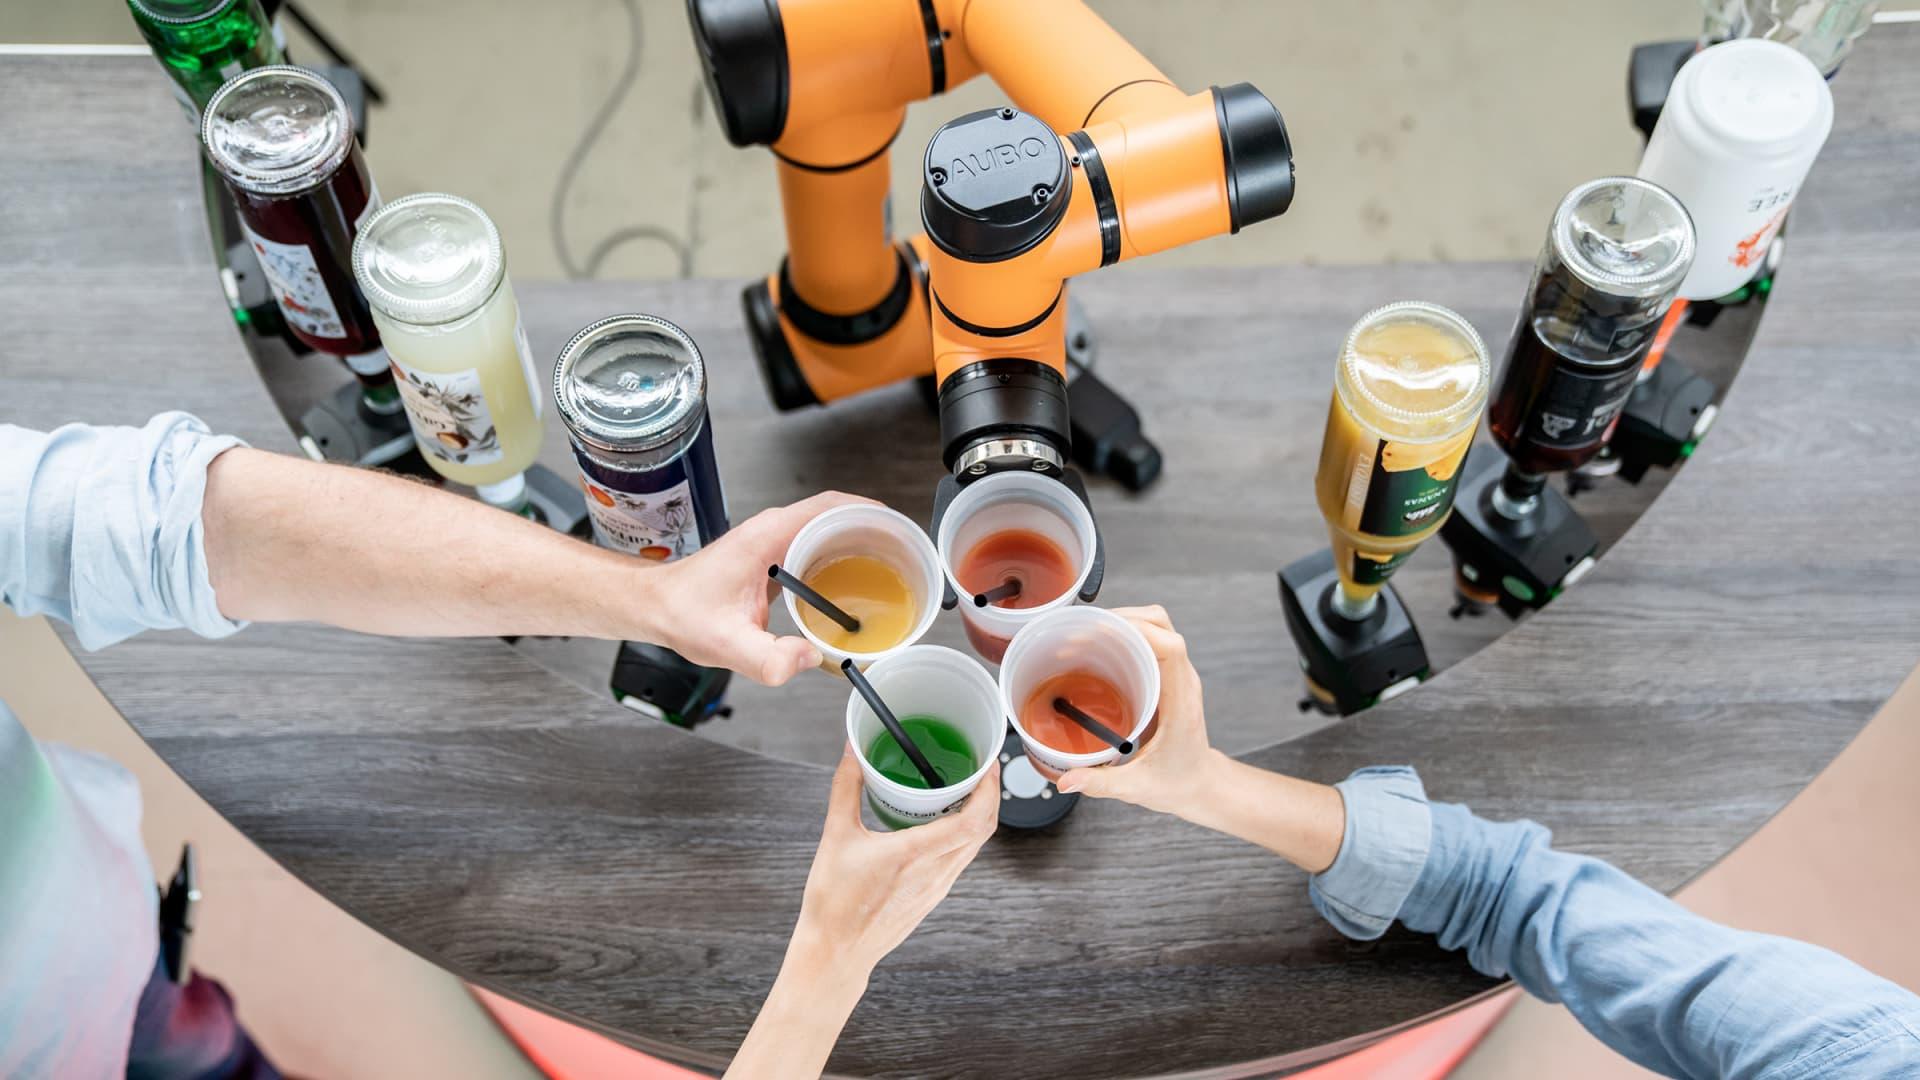 myRocktail - Alexander Bürkle robotic solutions